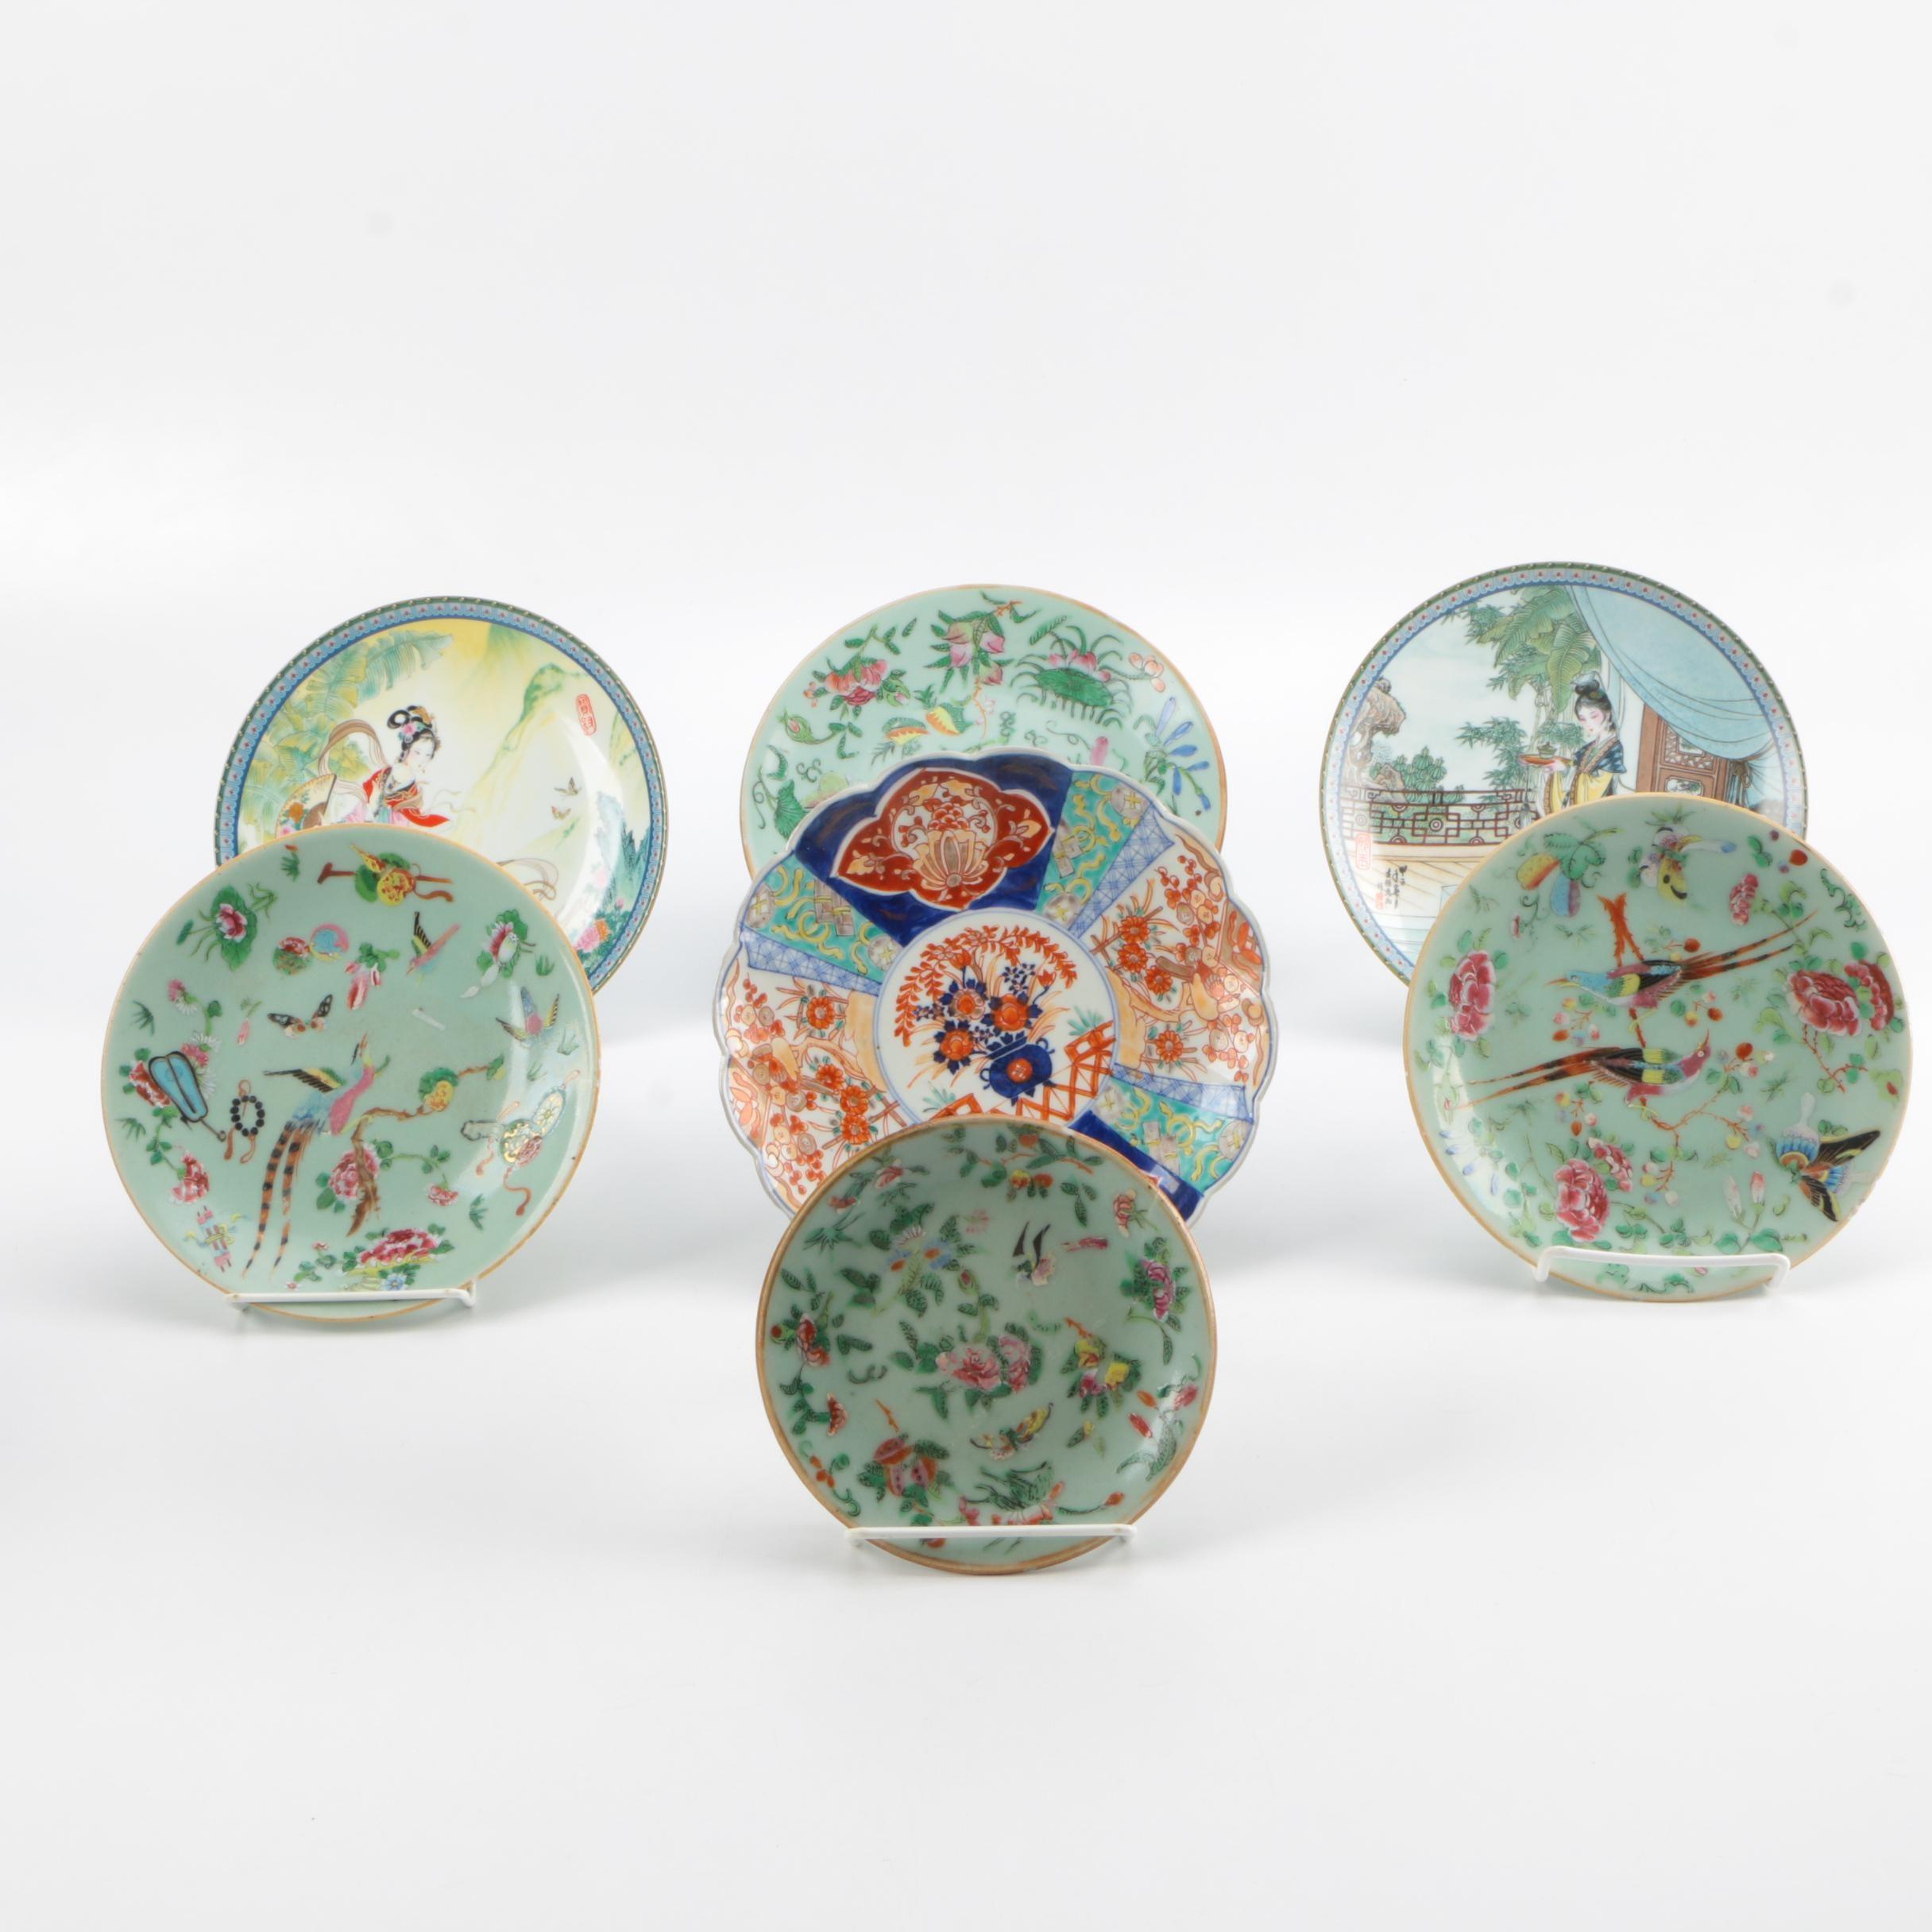 Assortment of East Asian Ceramic Plates Including Imperial Jingdezhen